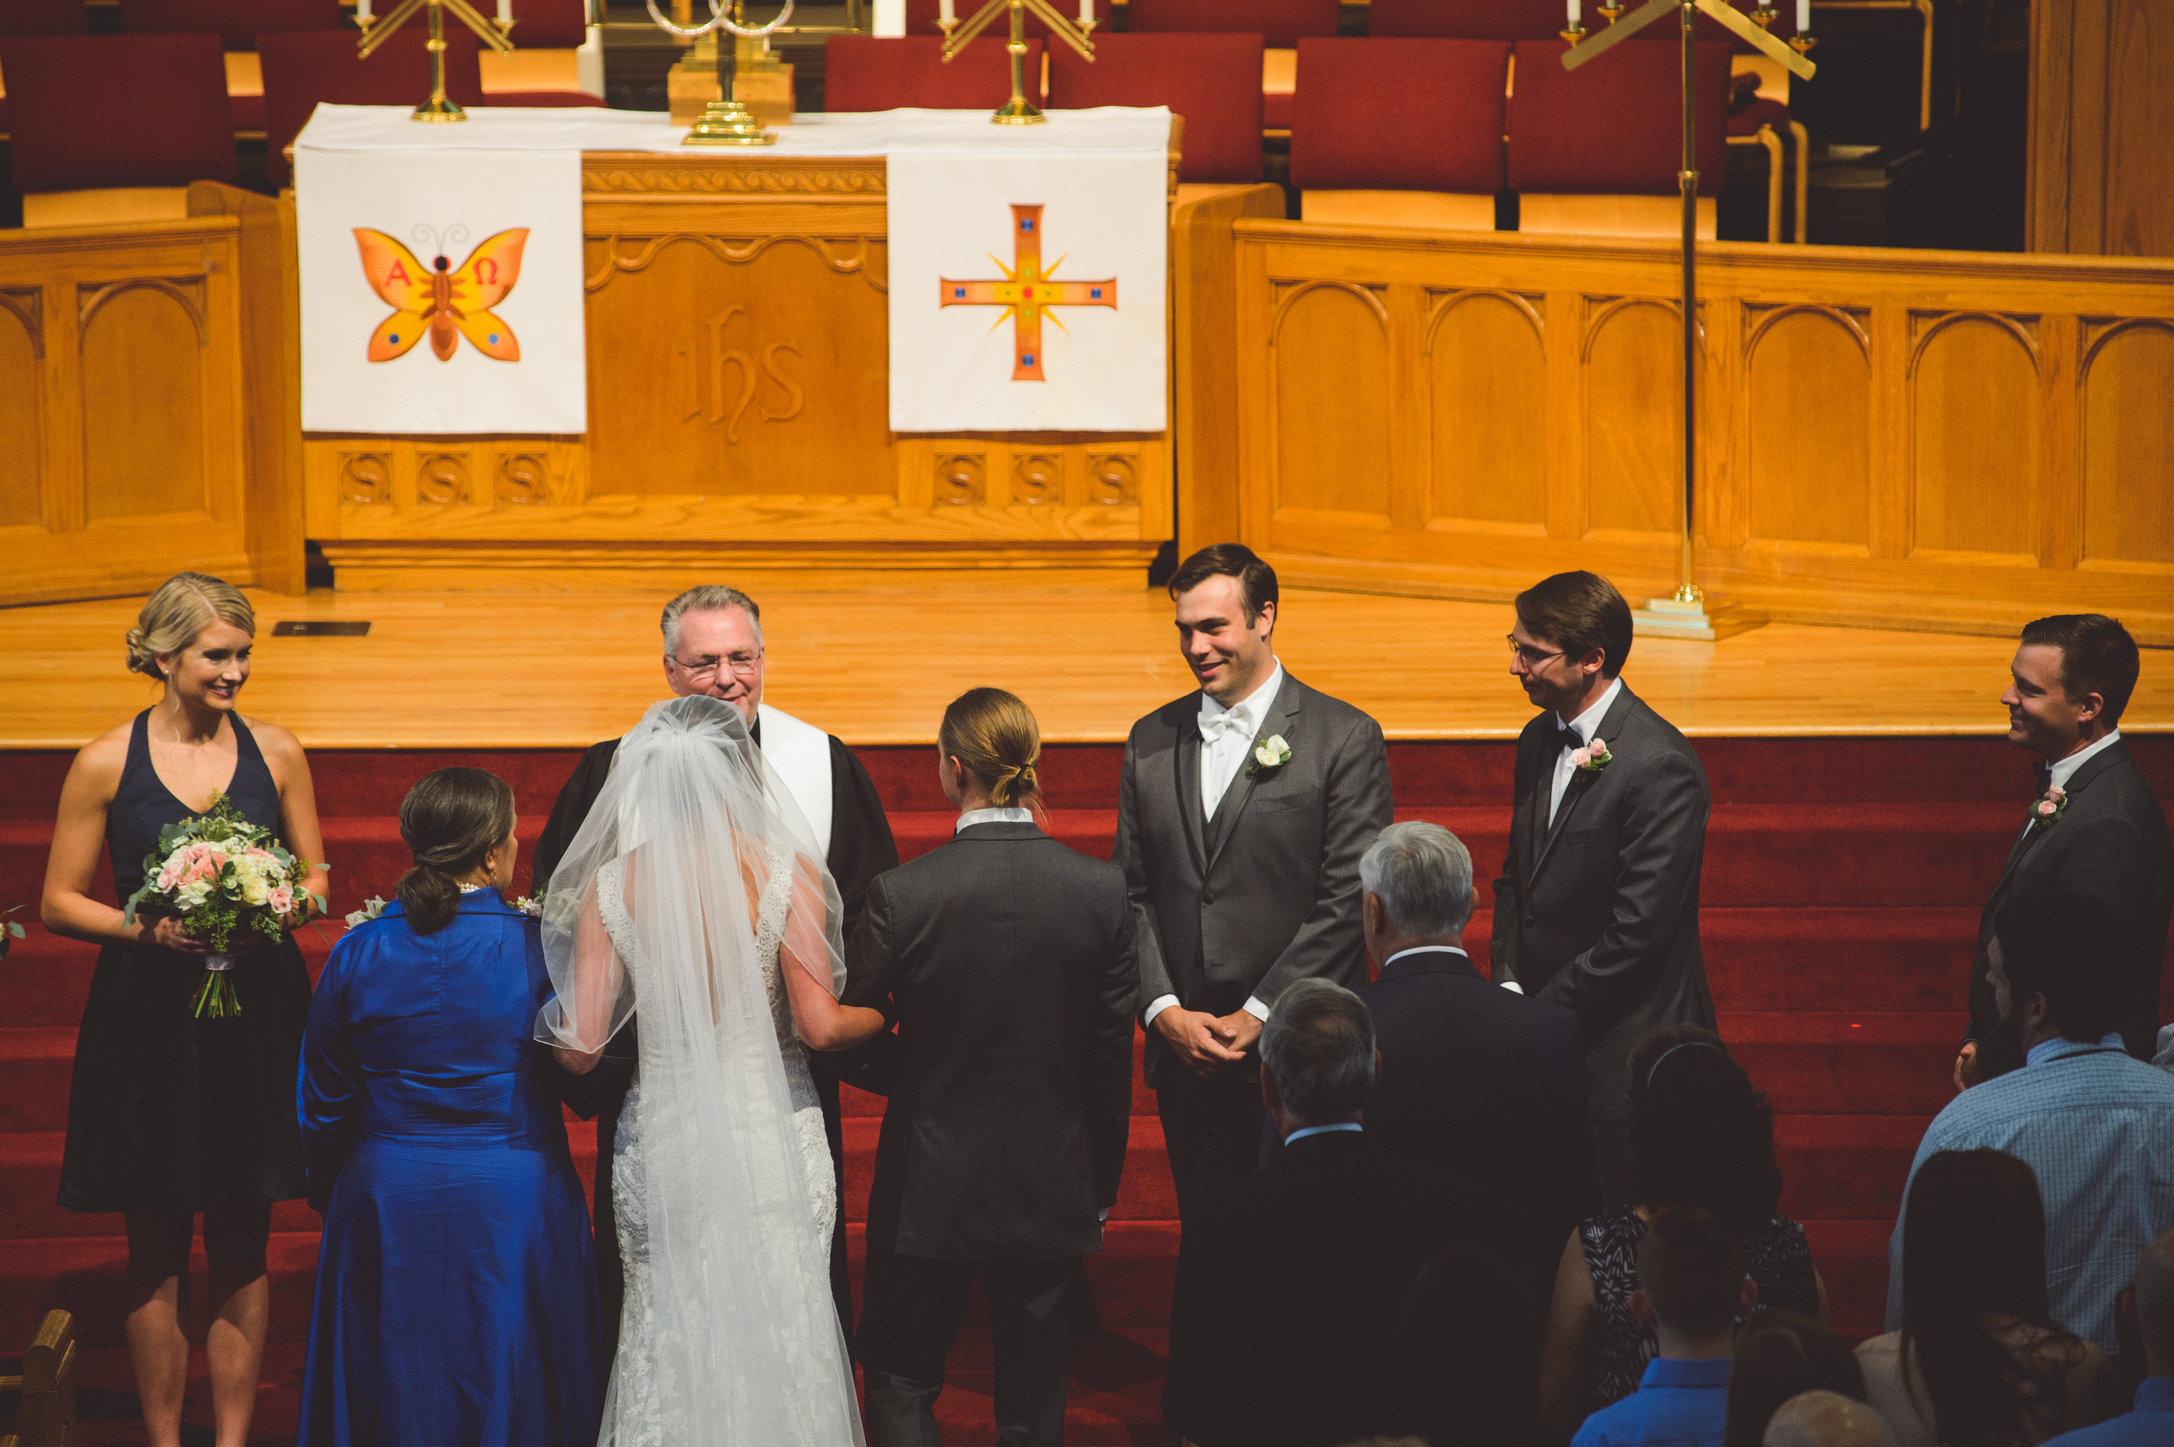 SandC-wedding-172.jpg